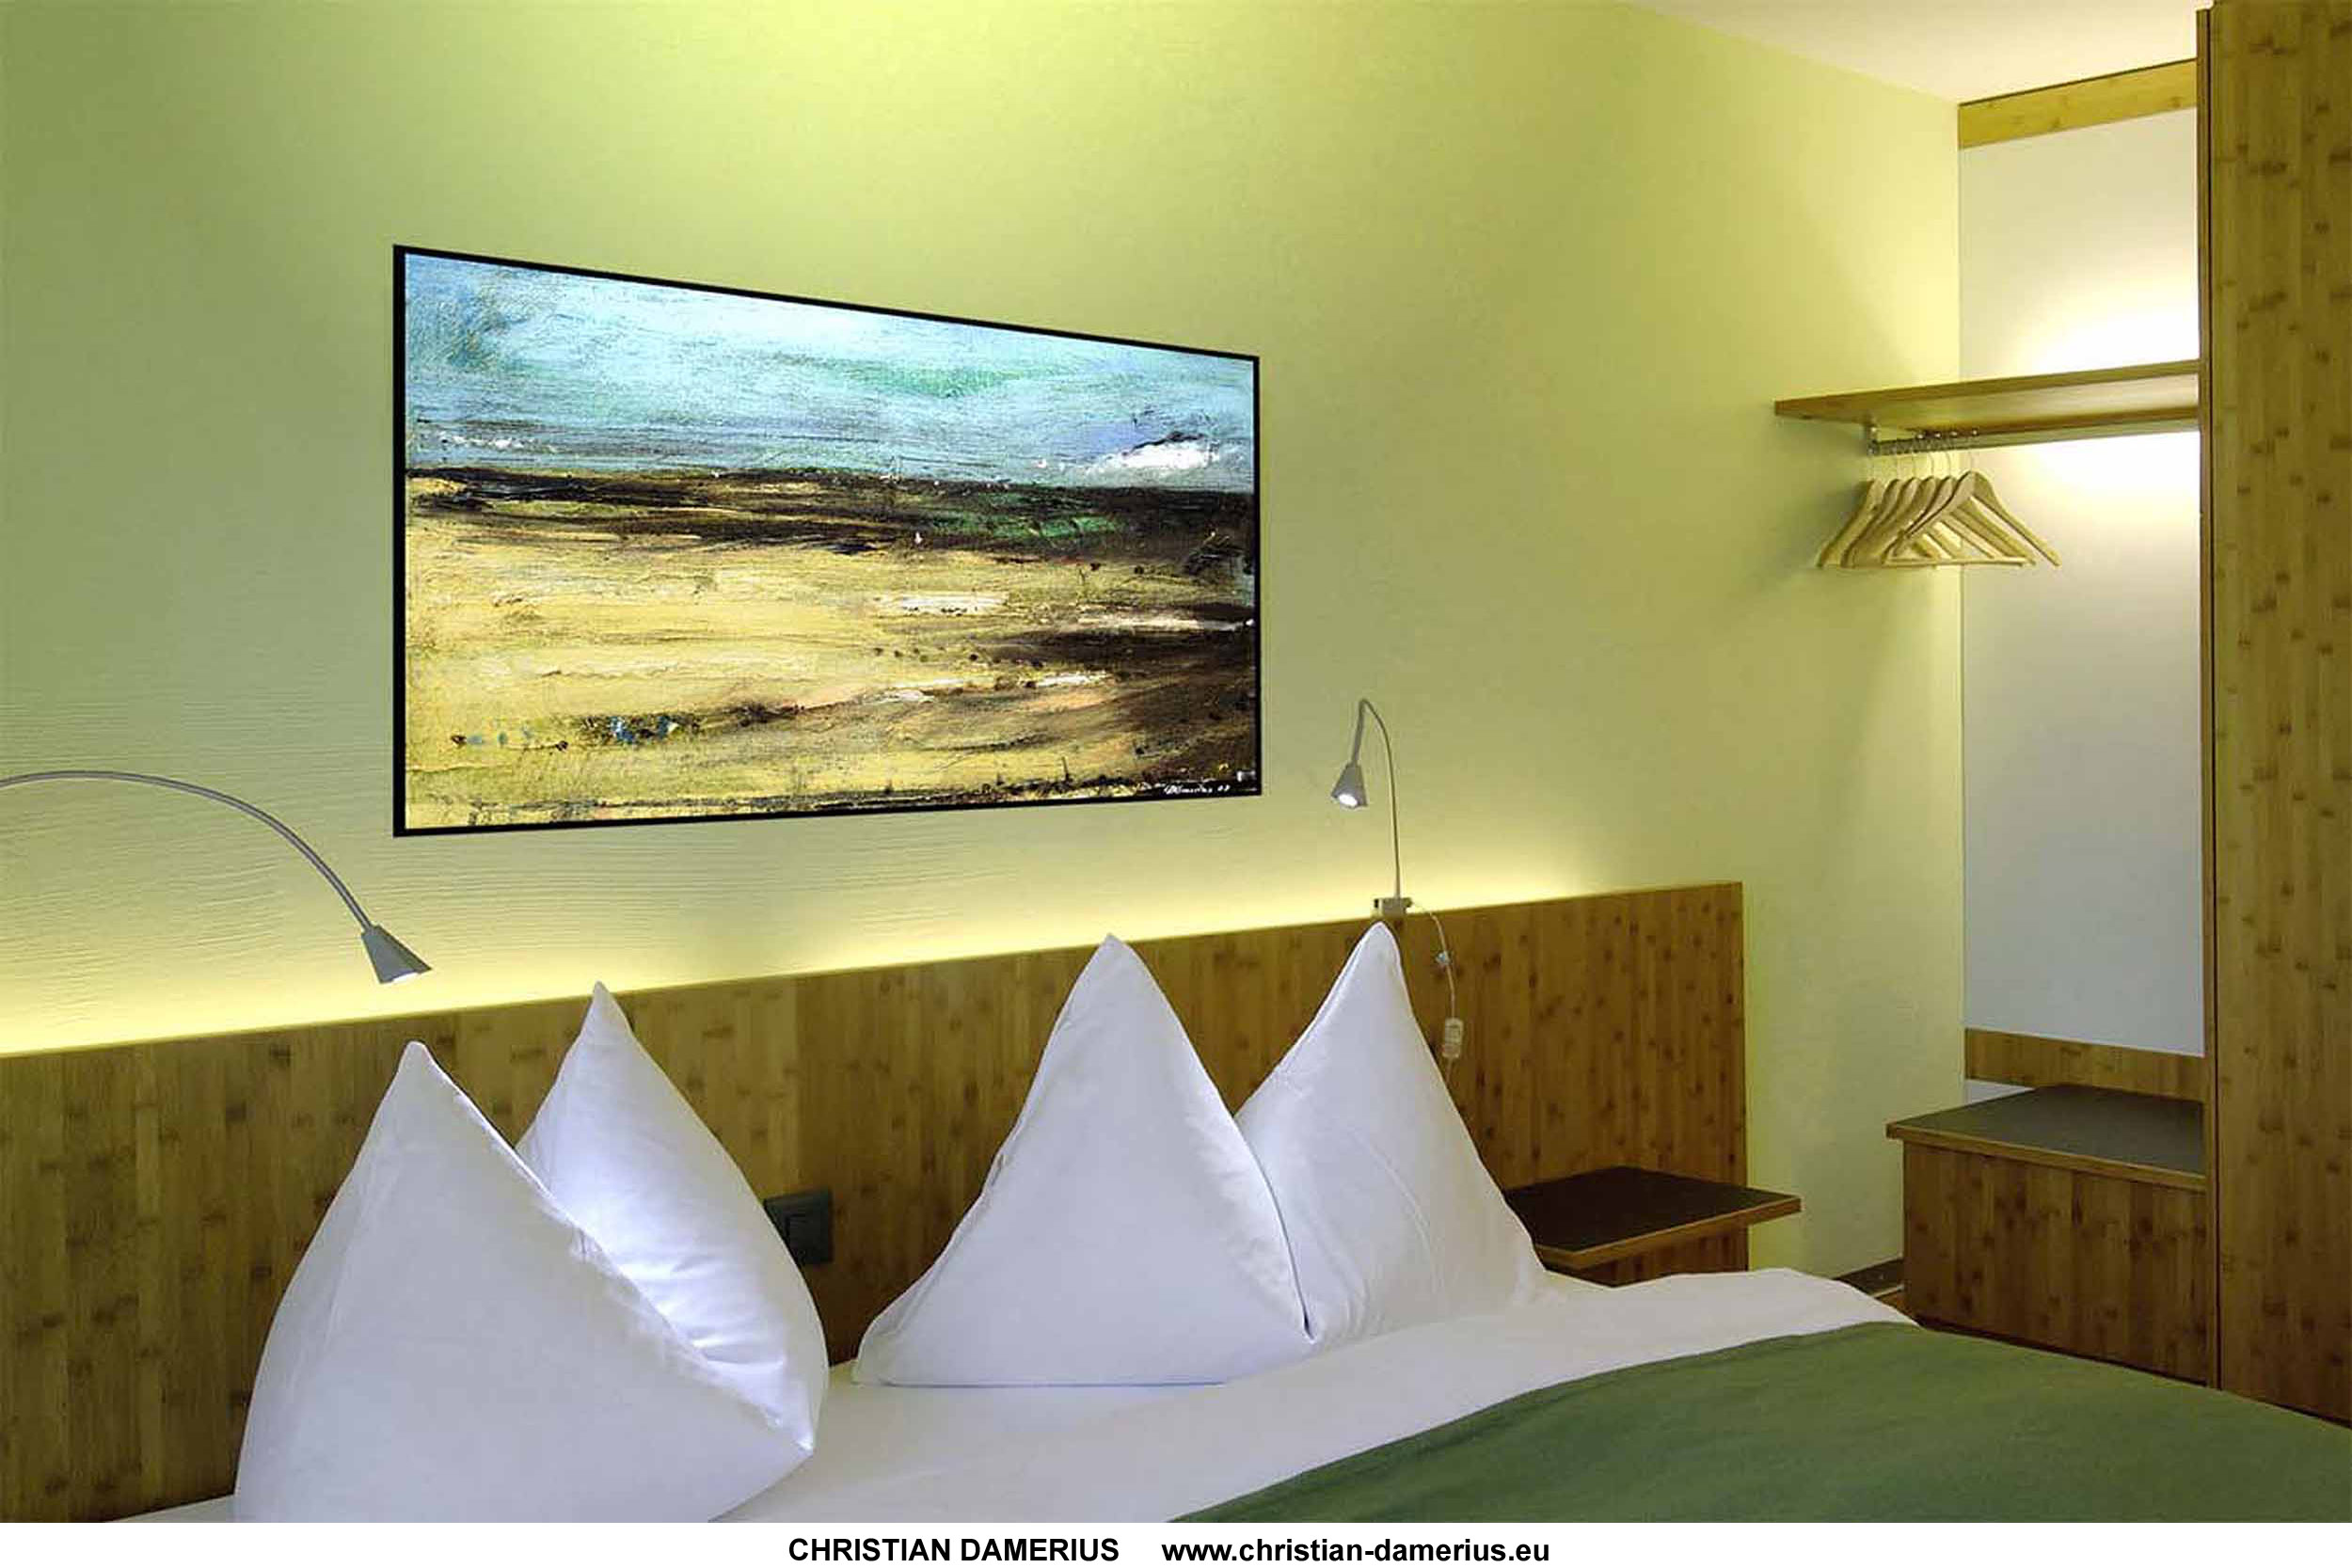 christian damerius raumgestaltung wandgestaltung b ros privatr ume malerei auftragsbilder. Black Bedroom Furniture Sets. Home Design Ideas